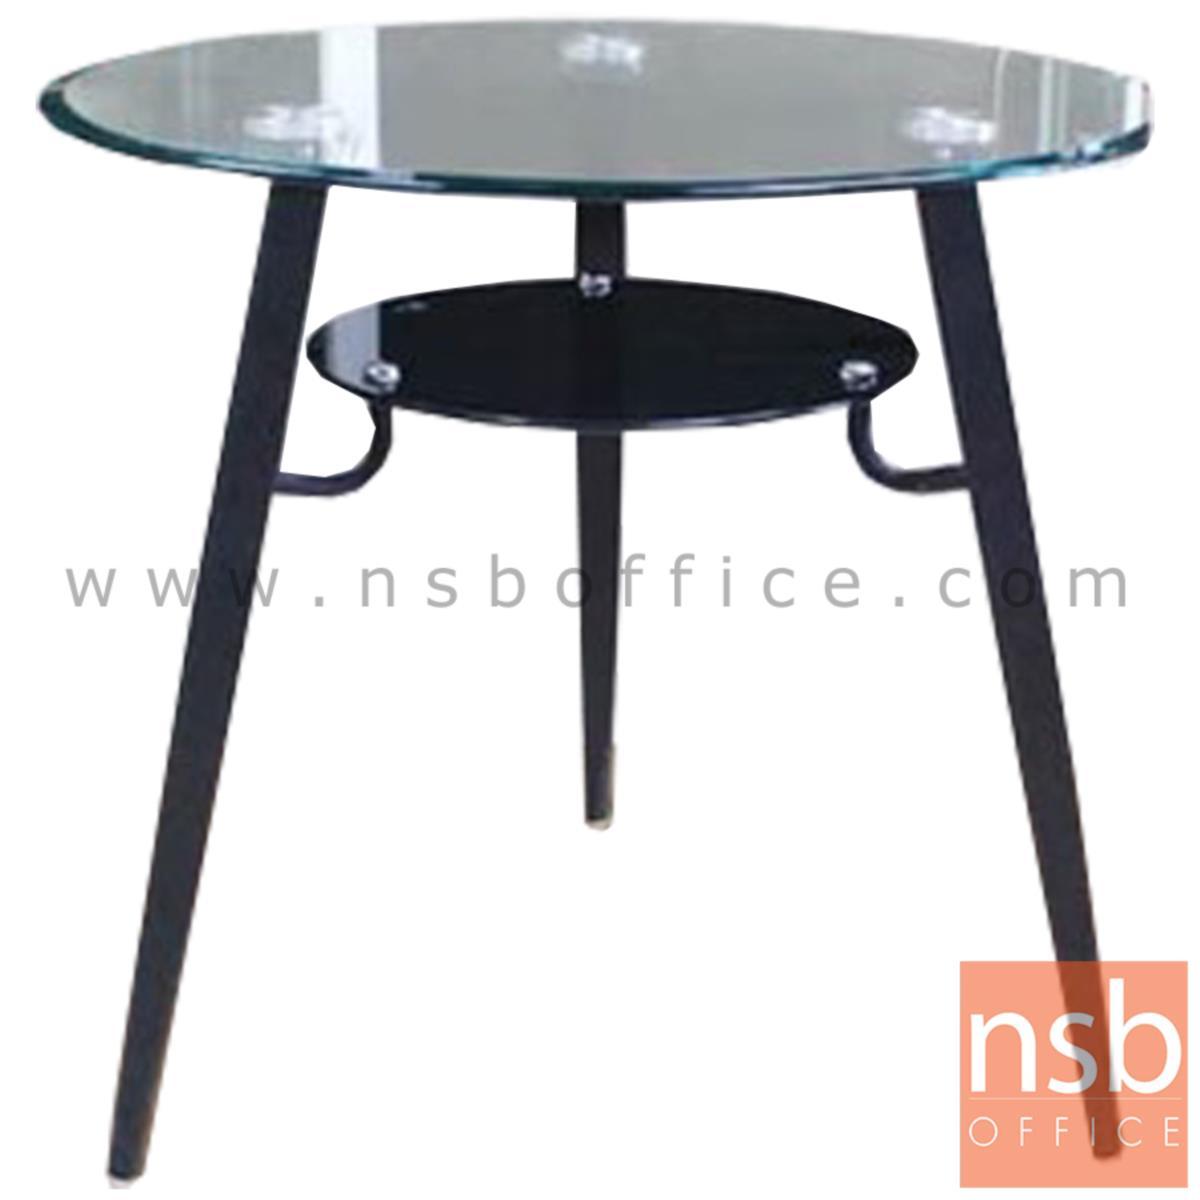 A09A138:โต๊ะกลมหน้ากระจก รุ่น MALLORCA (มายอก้า) ขนาด 80Di cm.